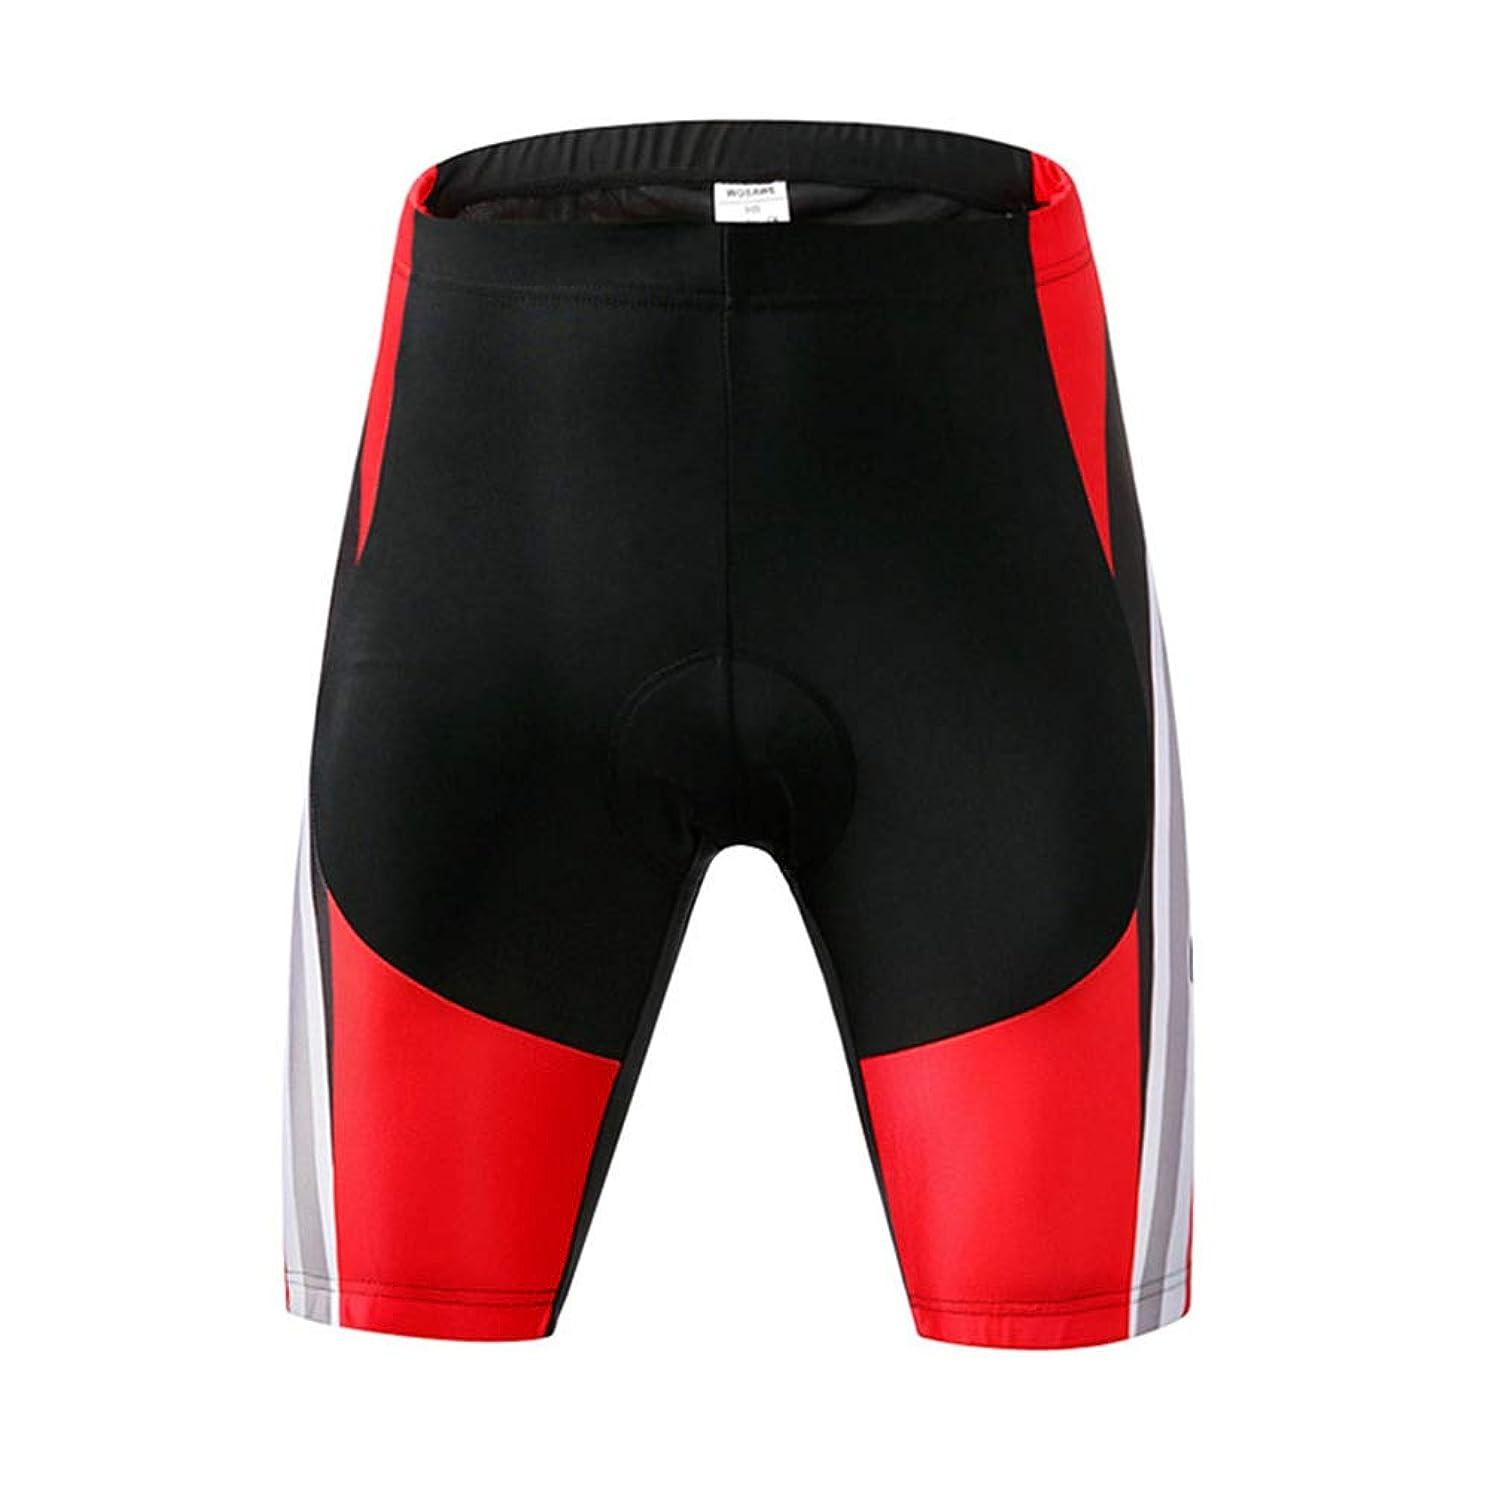 LSJZS Mens Gel Padded Cycling Shorts, Road Bike Shorts Bicycle Pants Cycling Clothing for Men